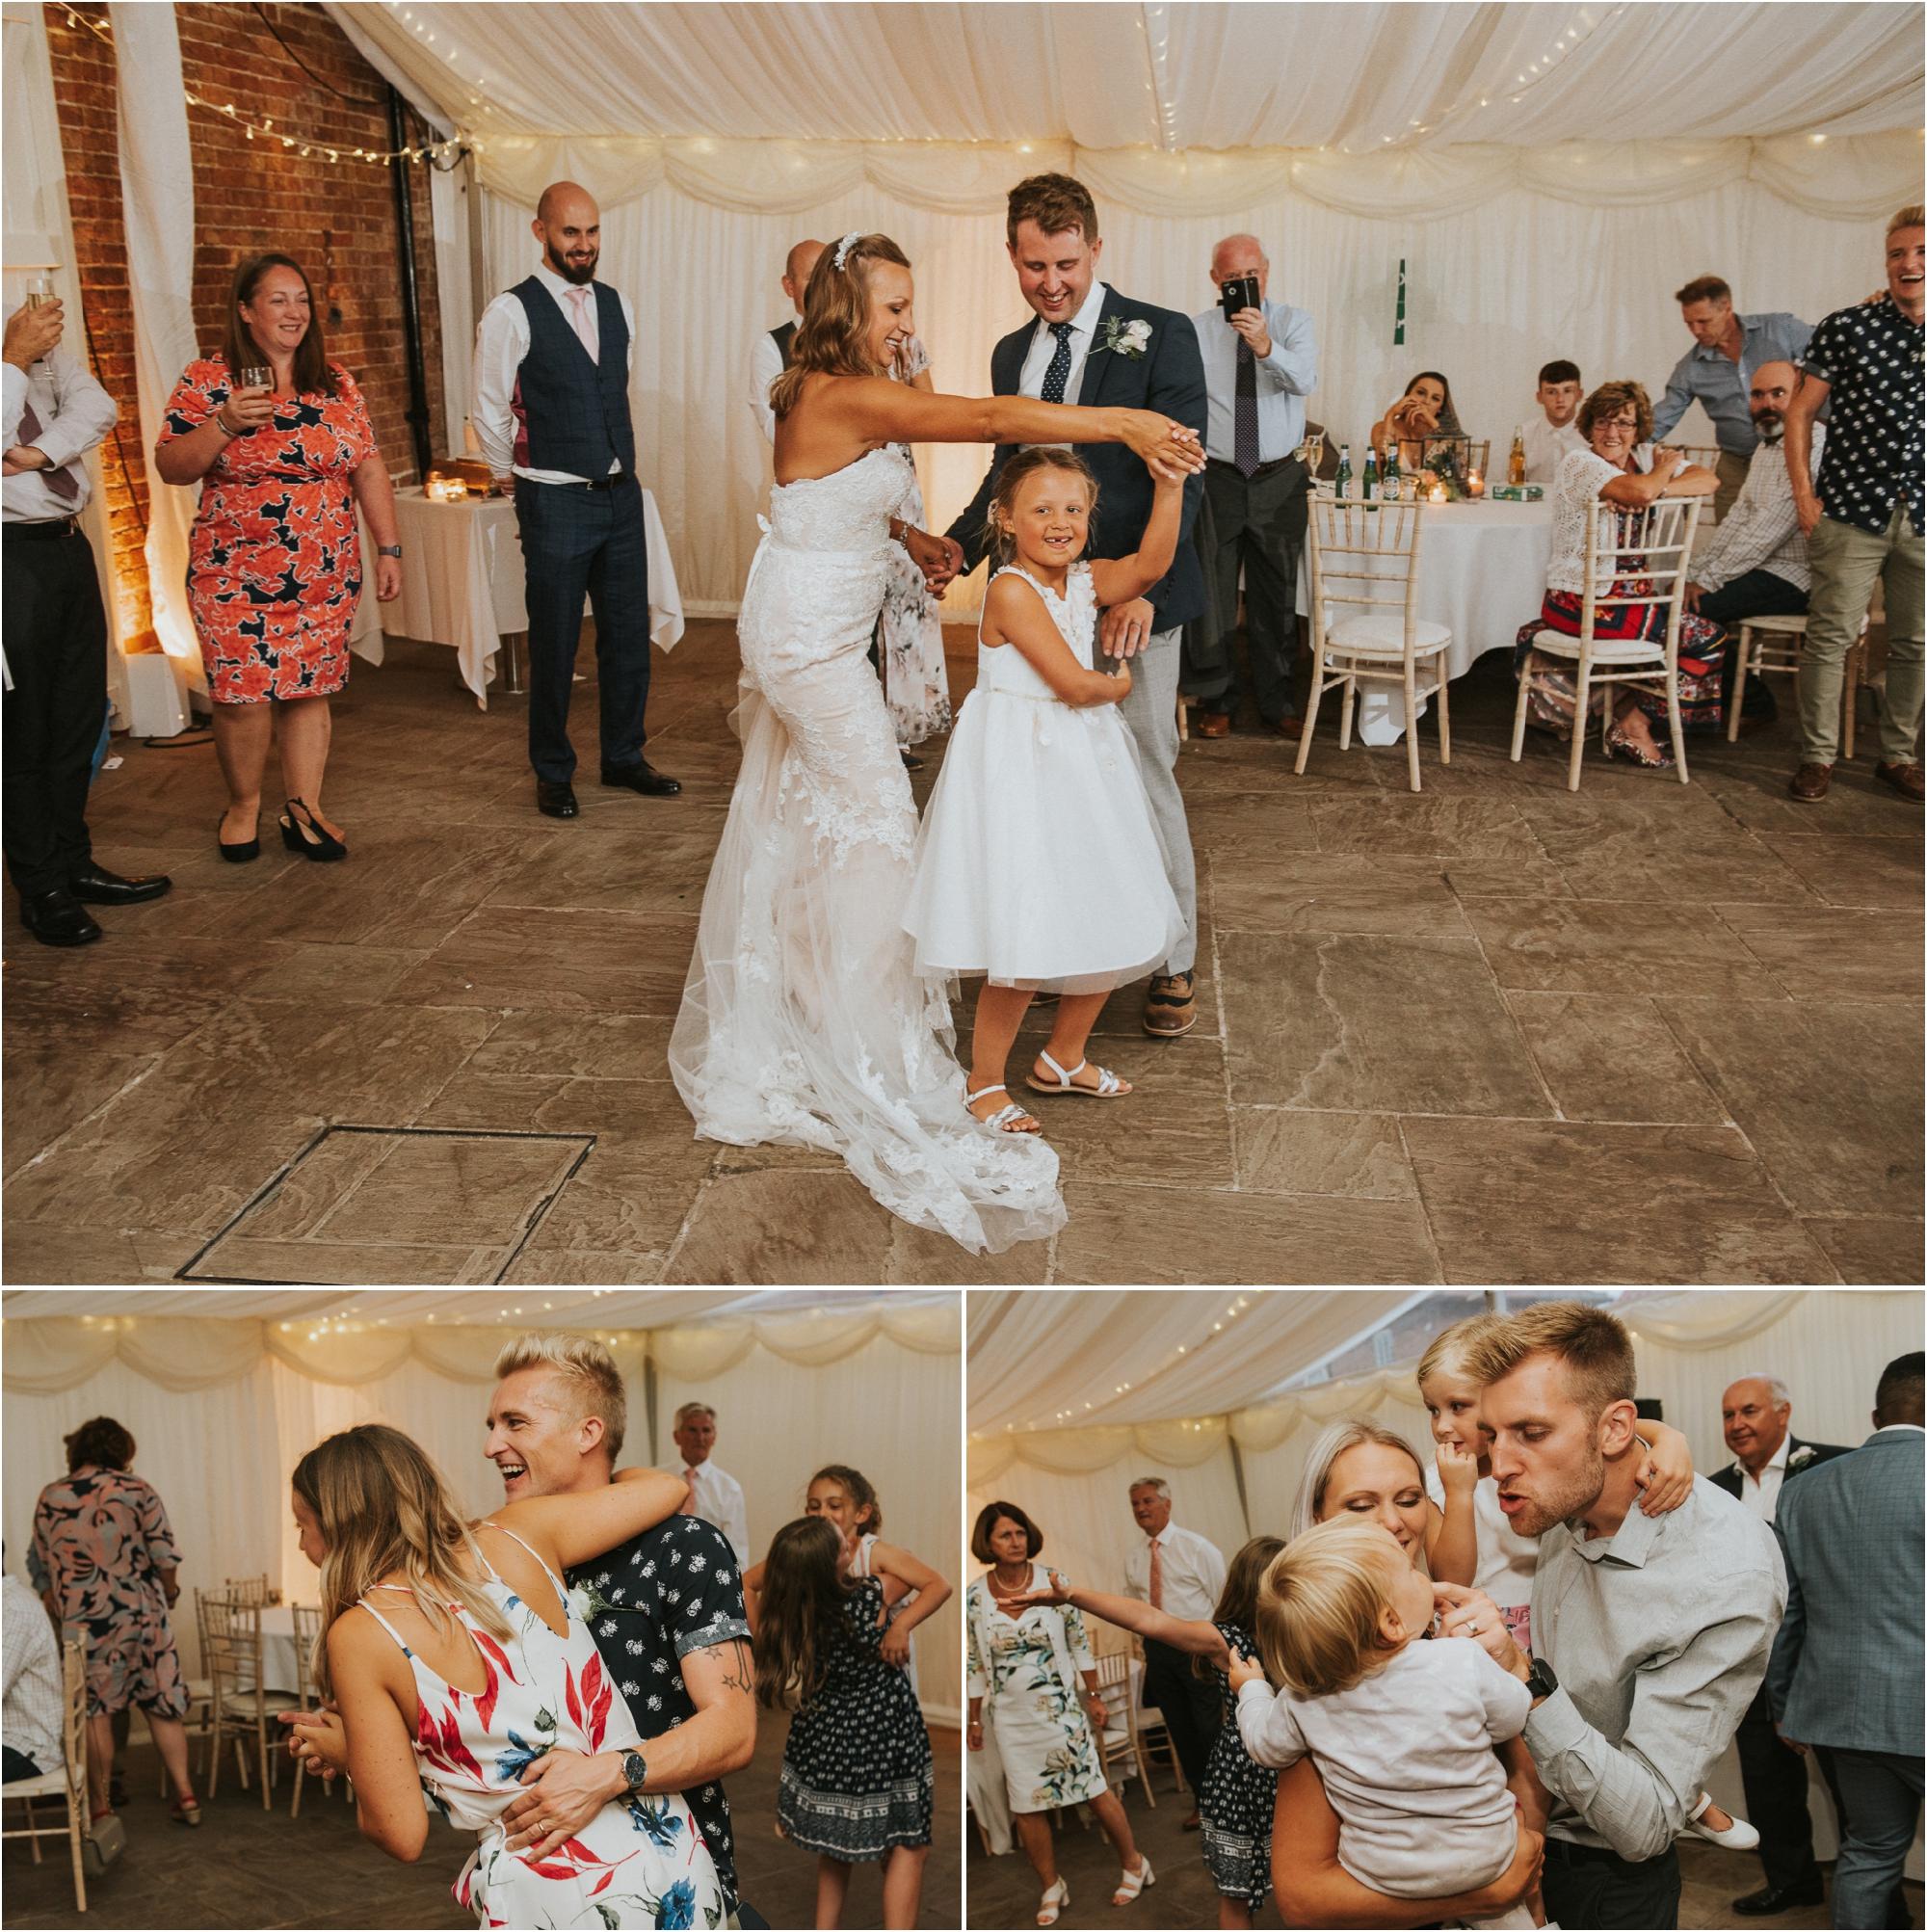 PheasantBrewery-LukeHolroyd-Yorkshirewedding_000207.jpg